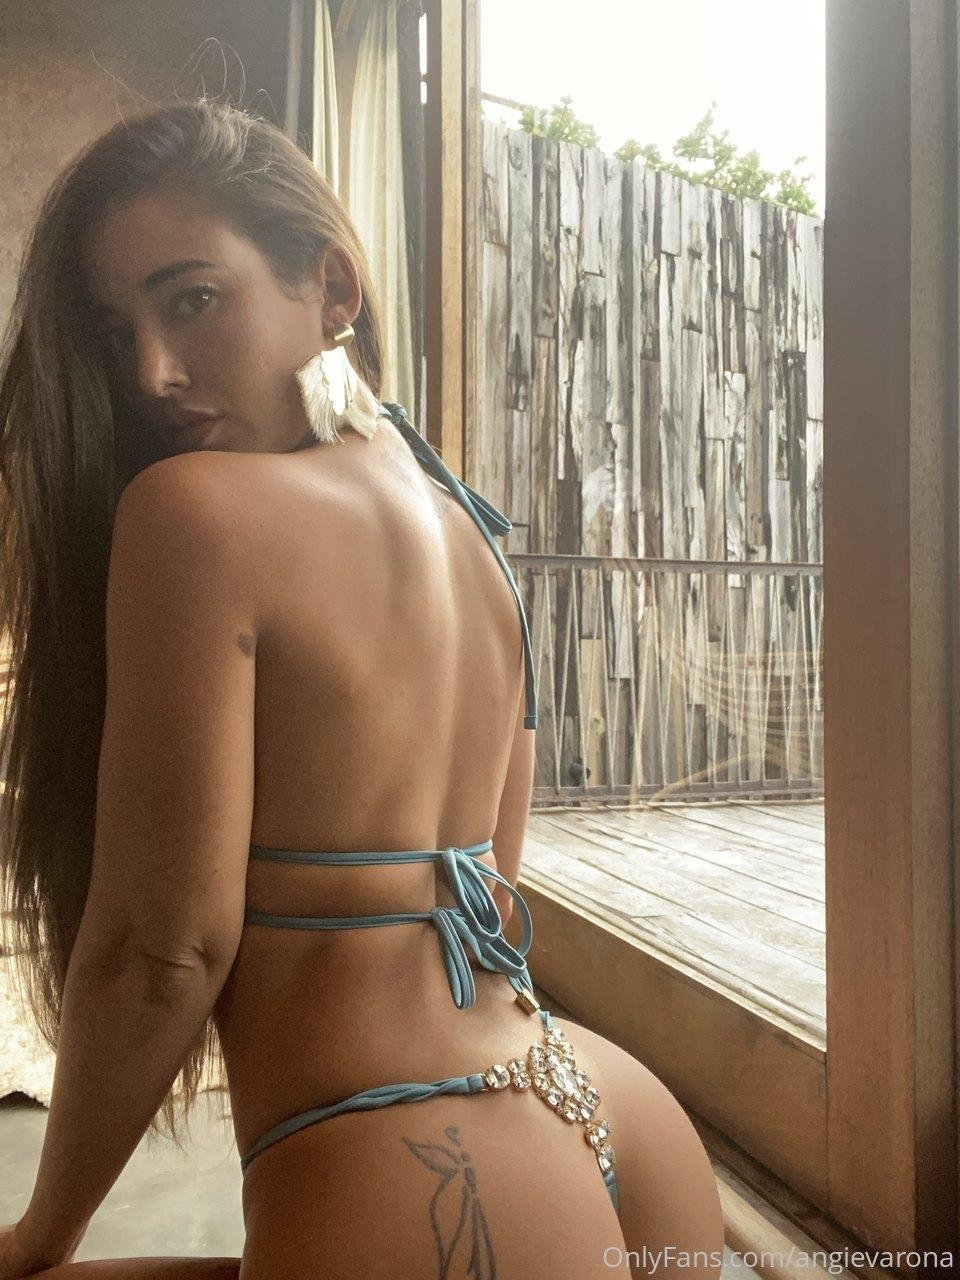 Angie Varona Onlyfans 0149